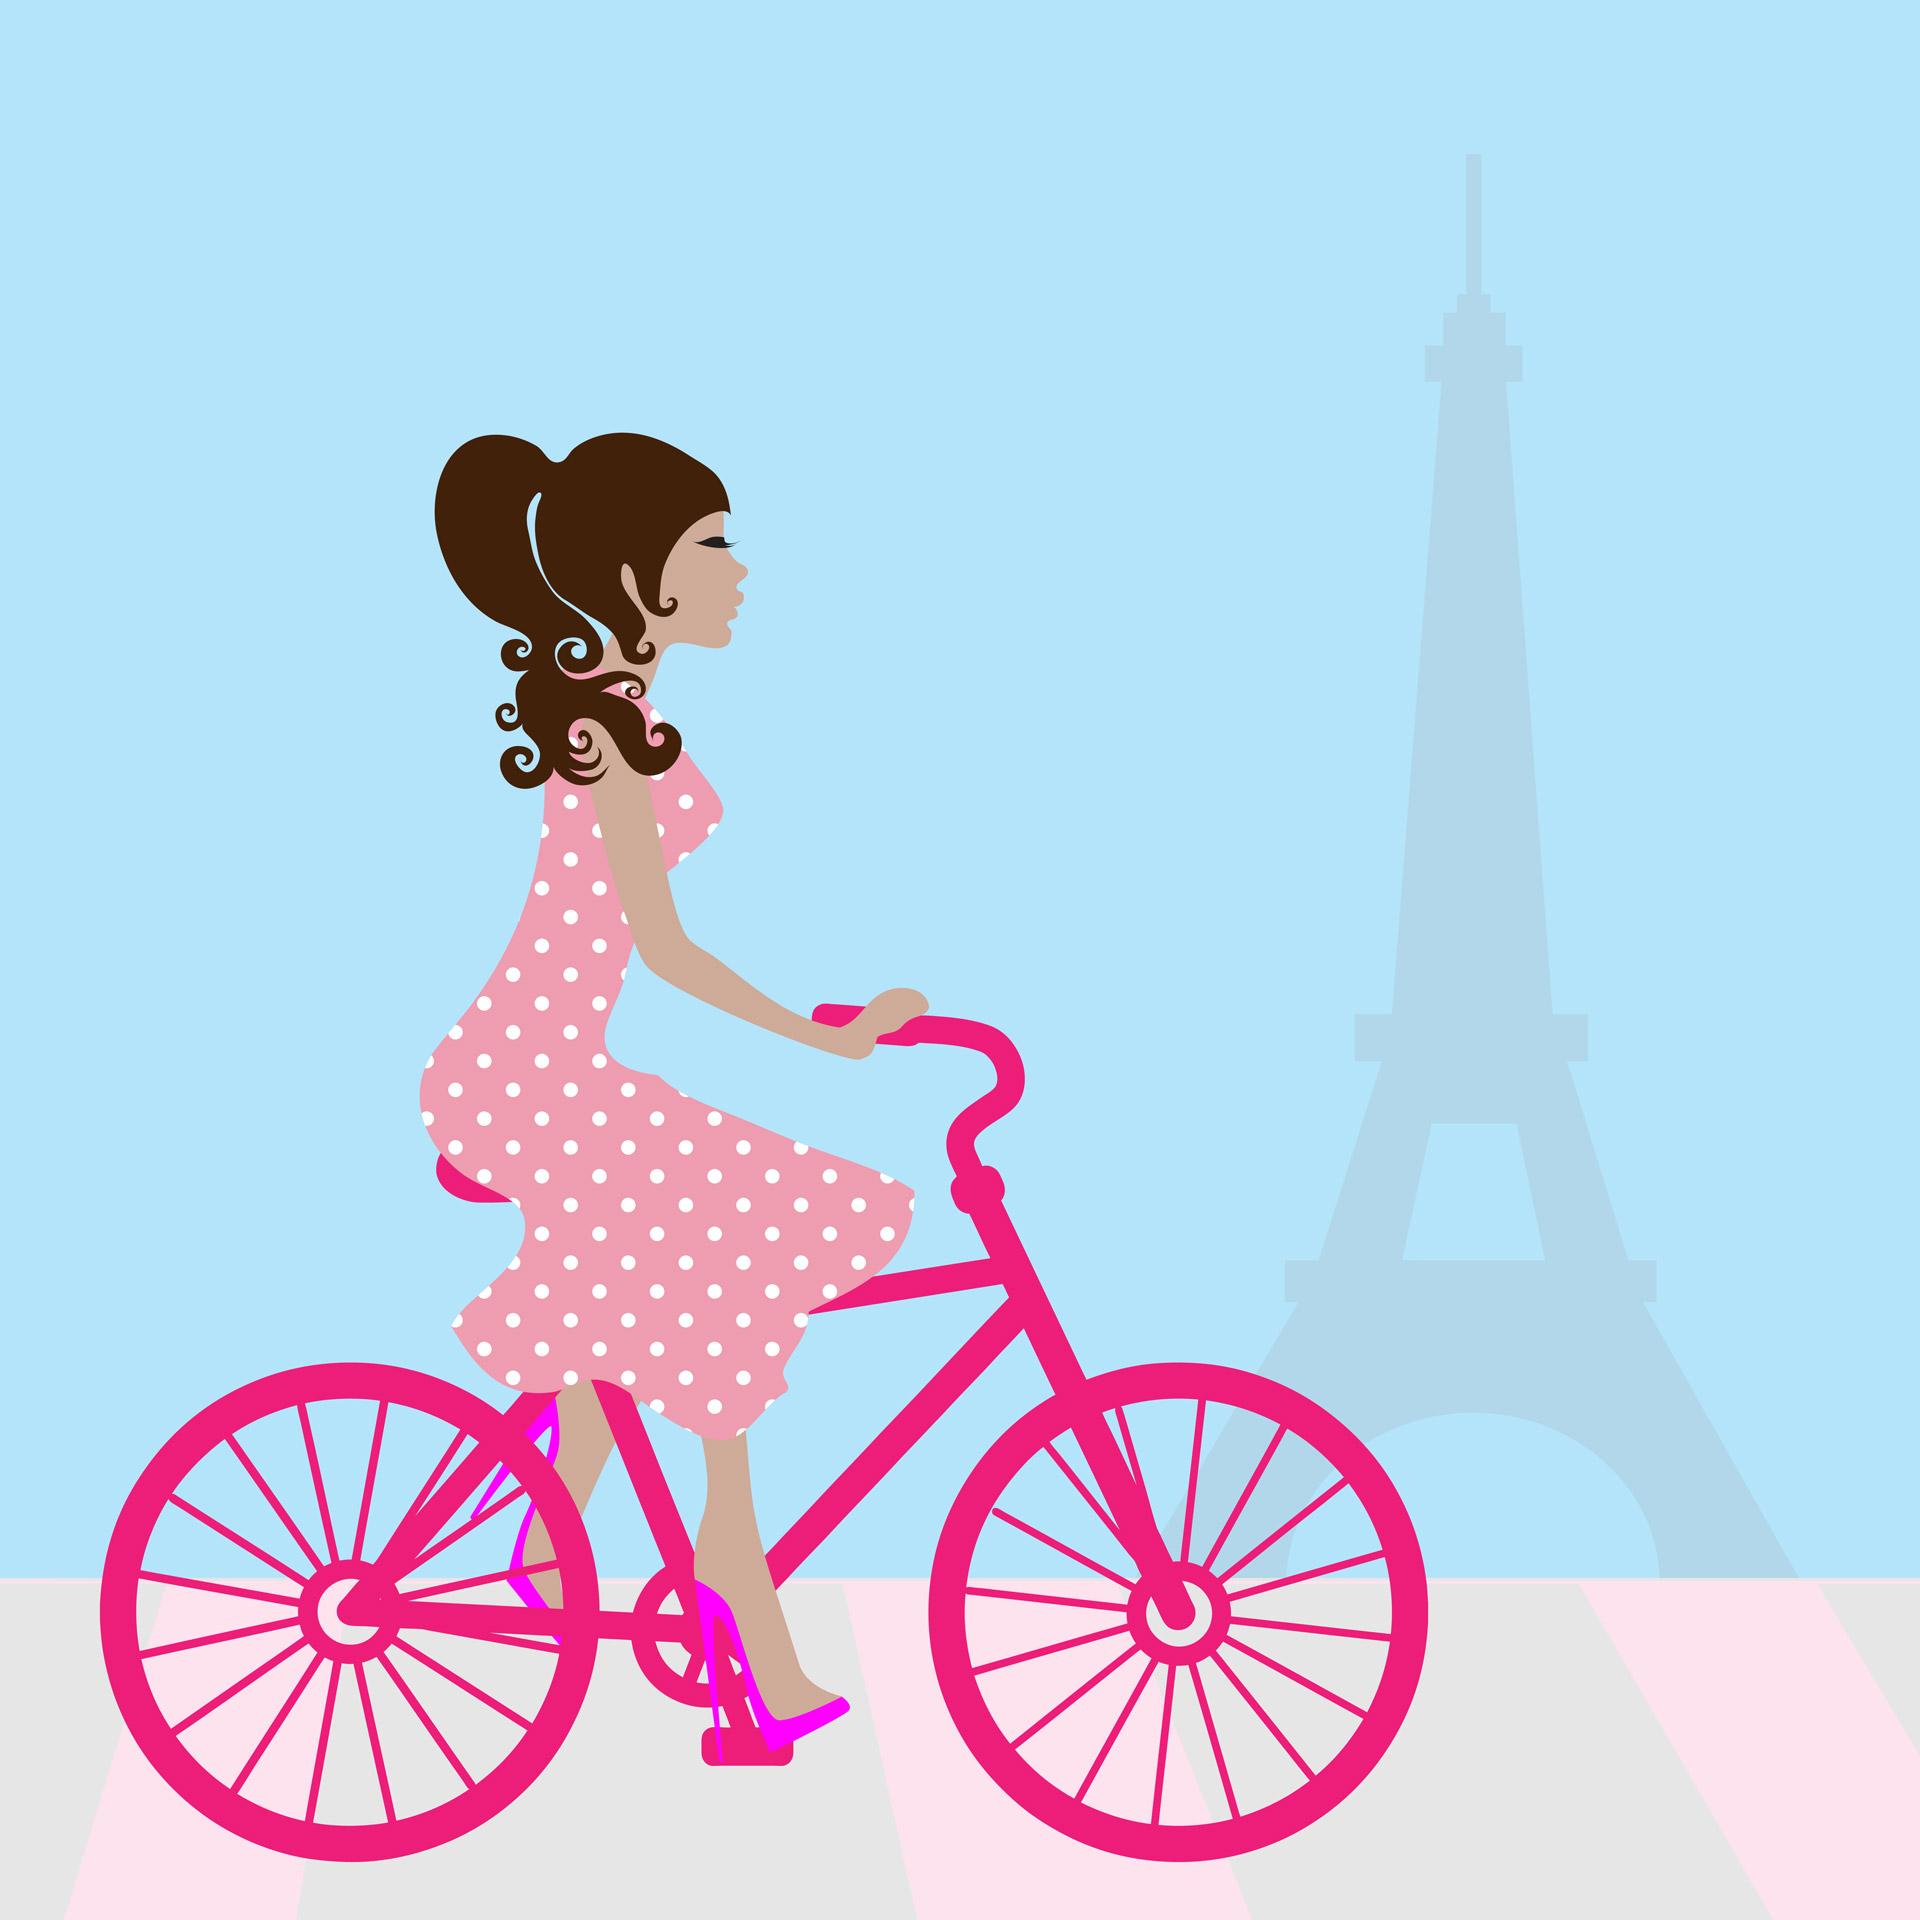 Bike clipart cycling. Girl in paris free